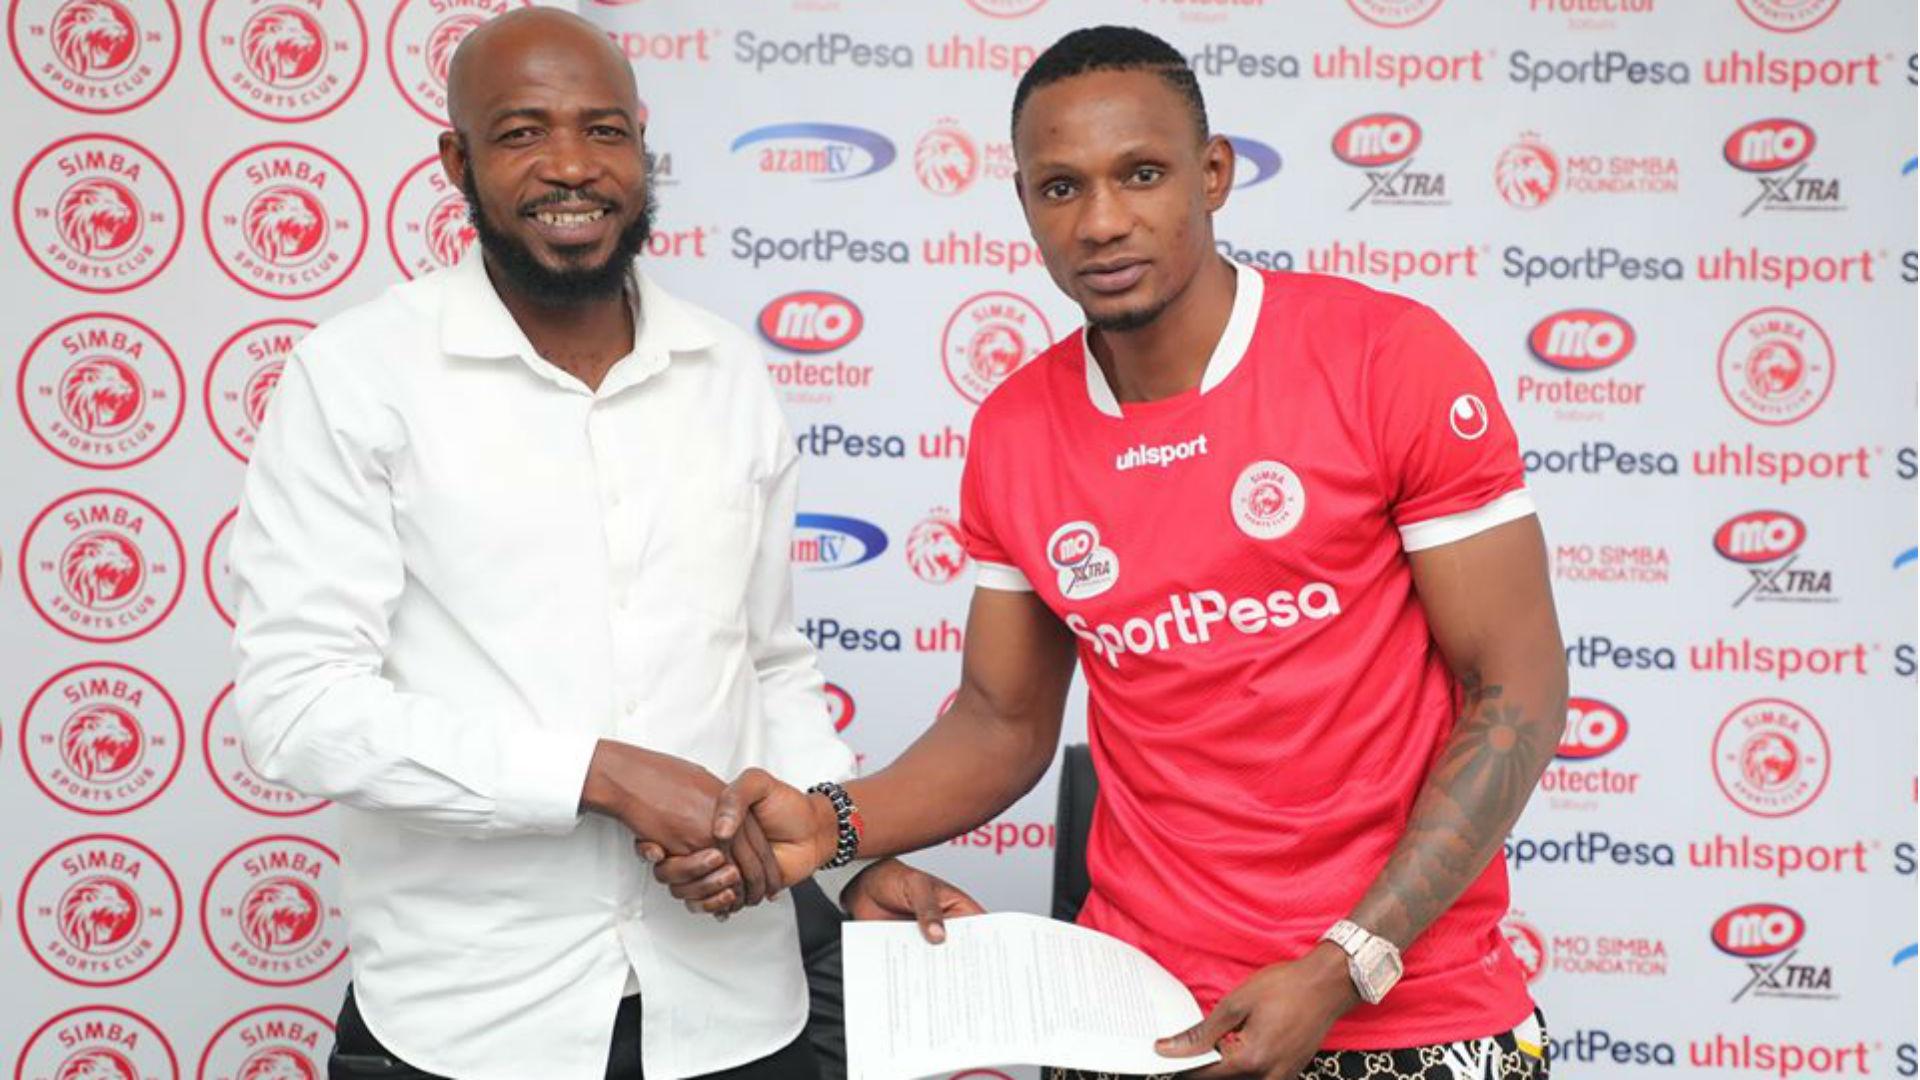 Mugalu: Simba SC sign Congolese striker from Lusaka Dynamos